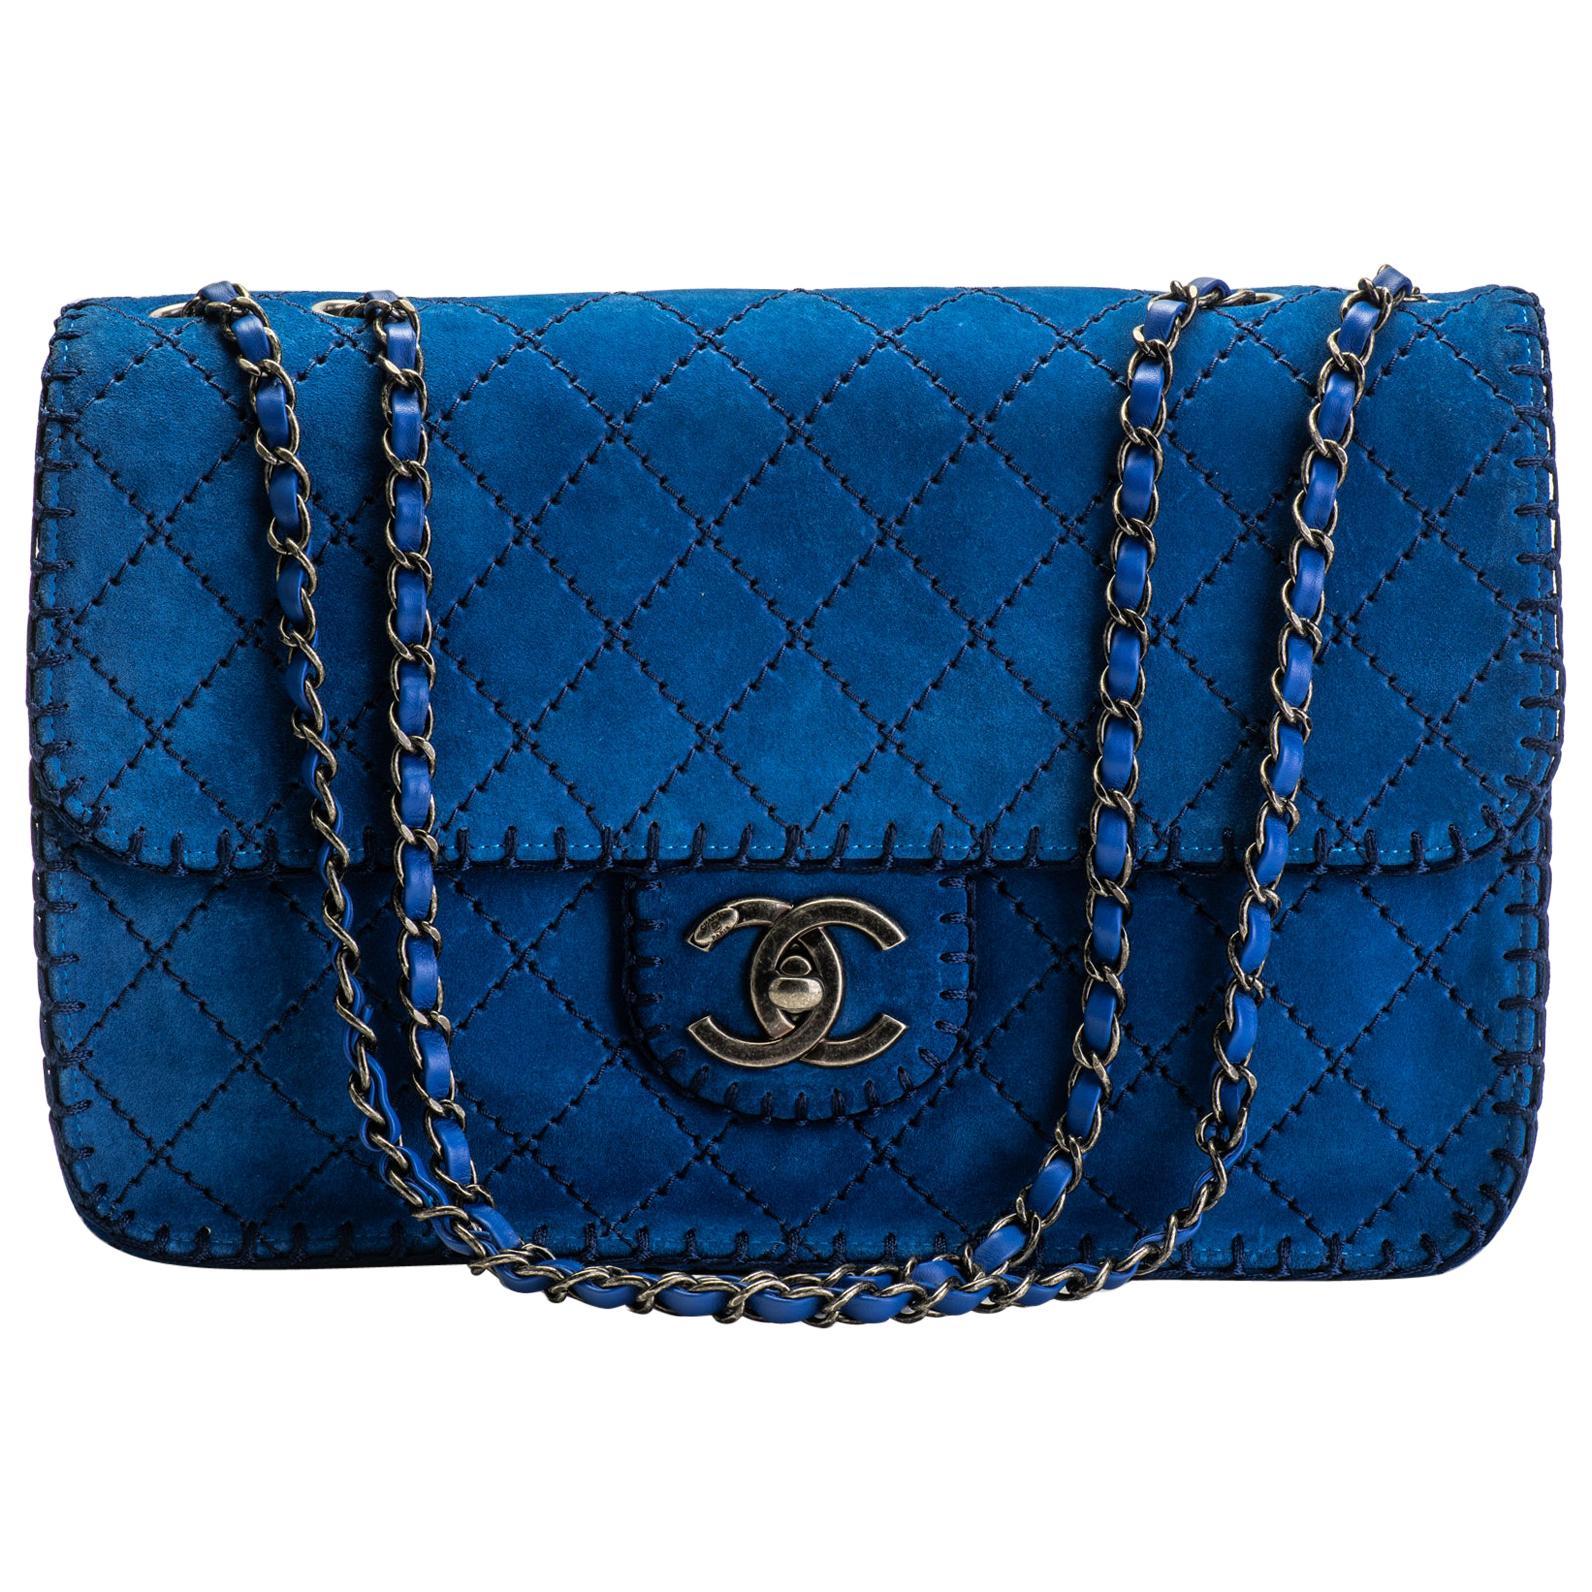 cfb06f89f Vintage Chanel Purses and Handbags at 1stdibs